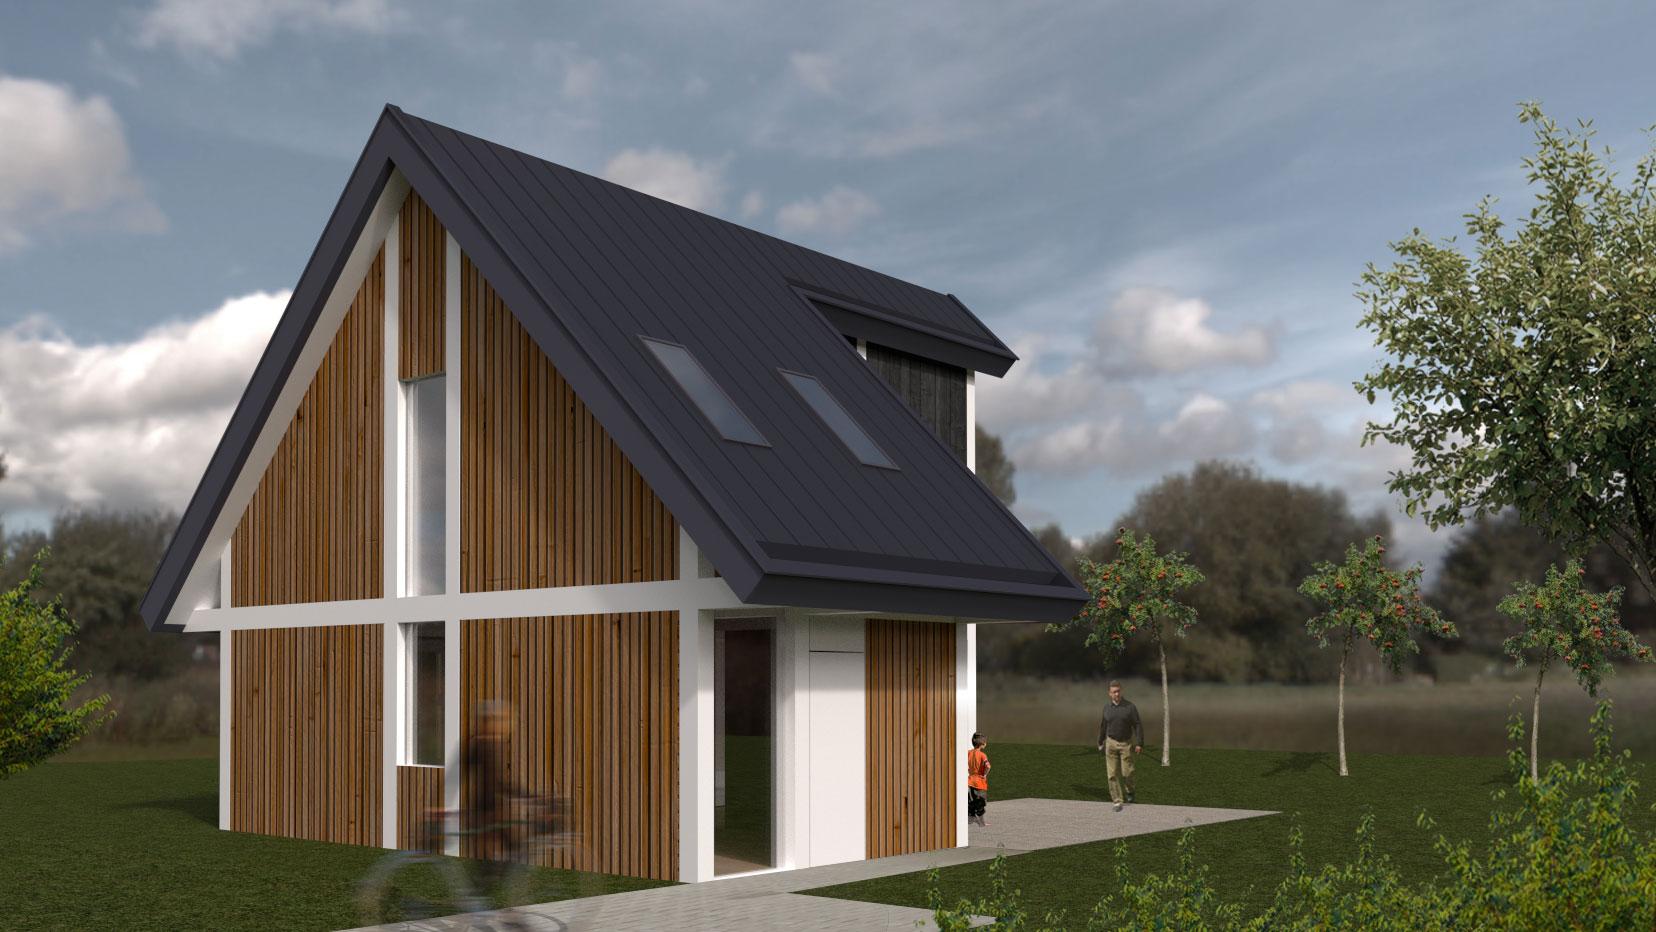 Moderne houten woning schuurwoning bouwen for Zelf huis bouwen kostprijs